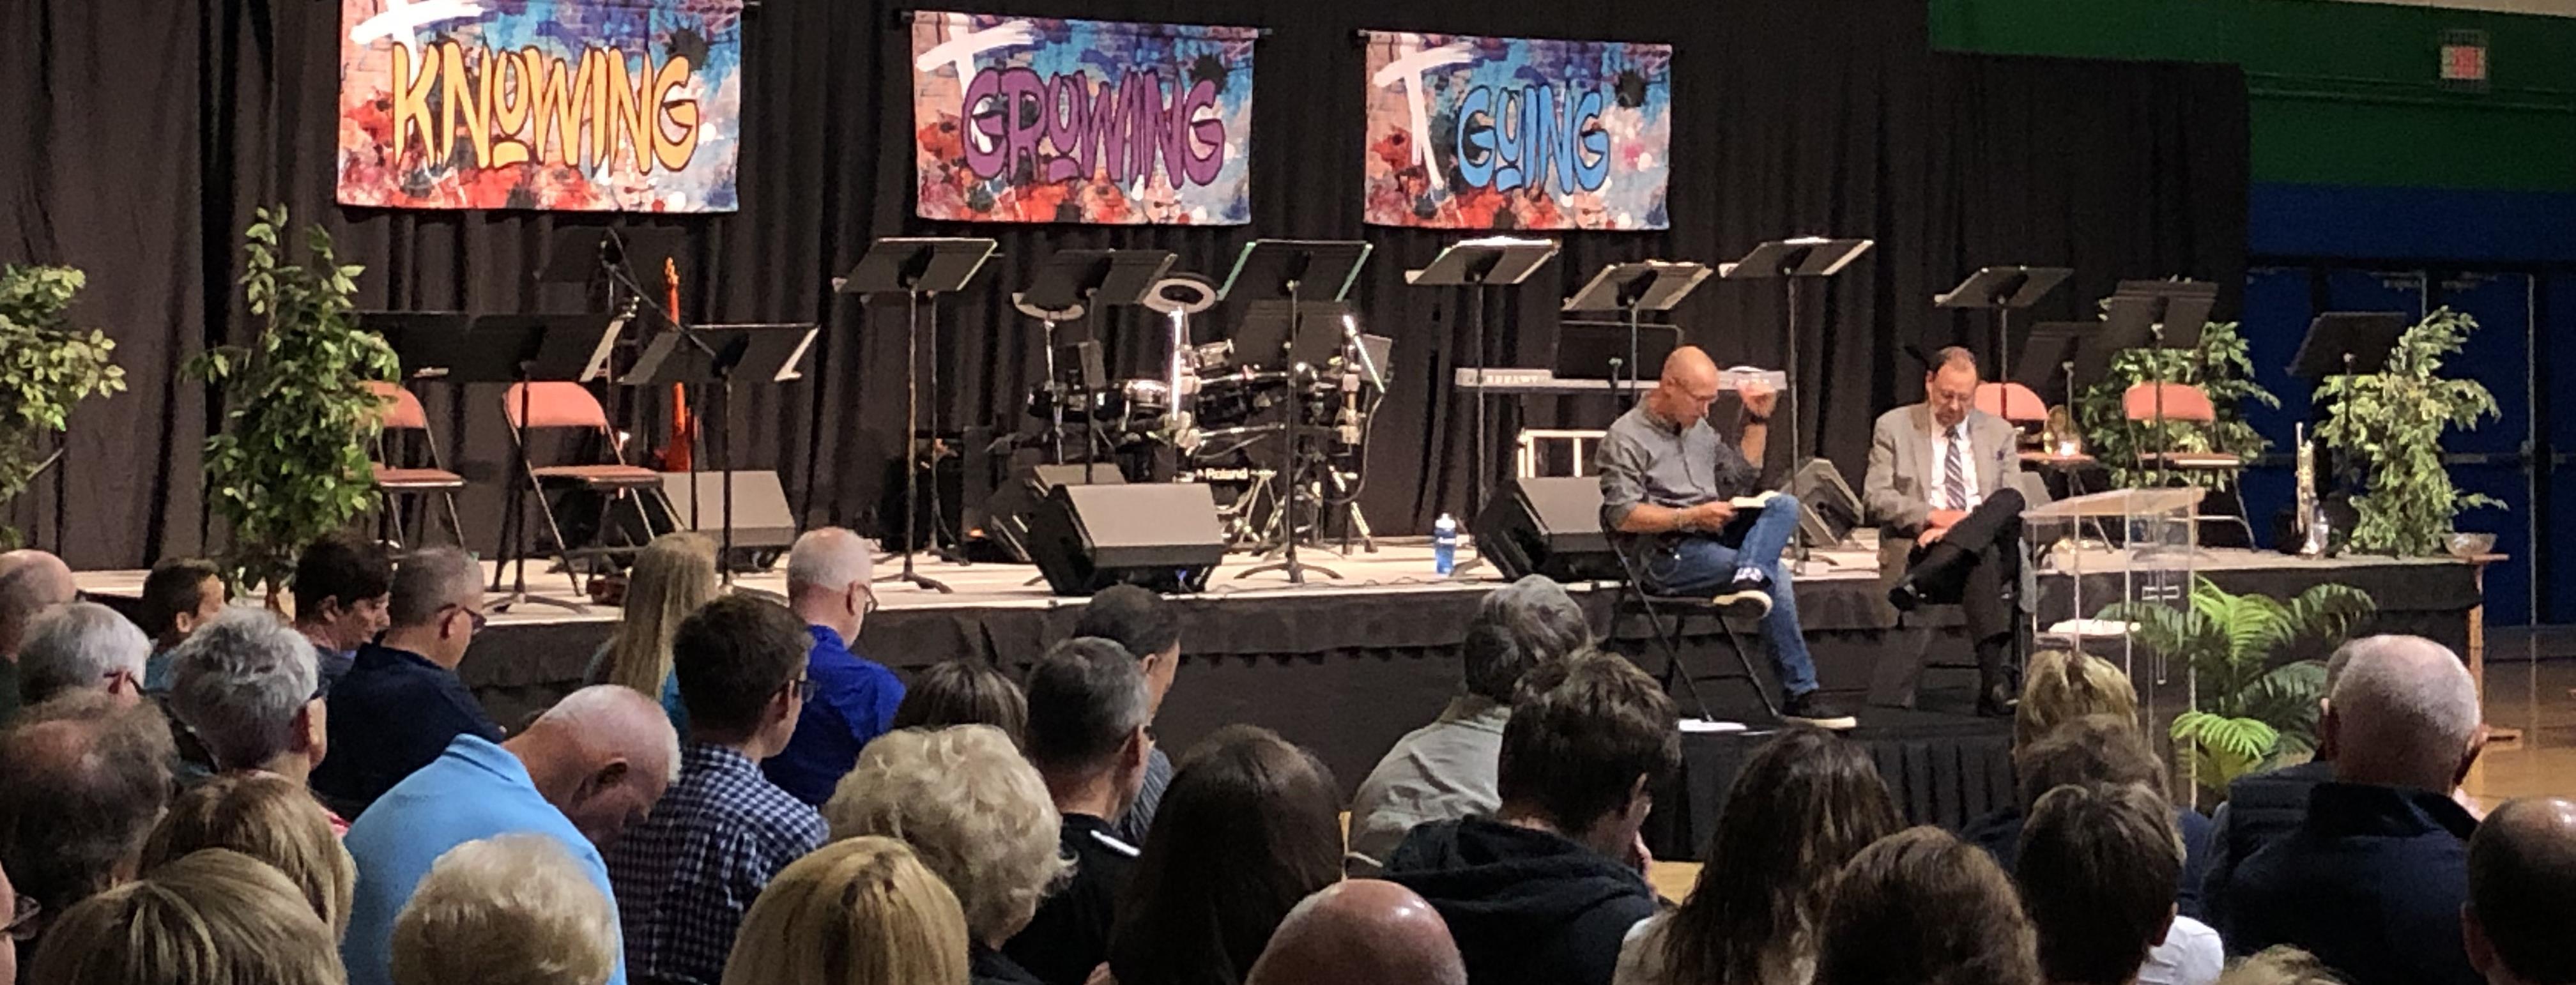 Contemporary Worship Service - Gym Photo